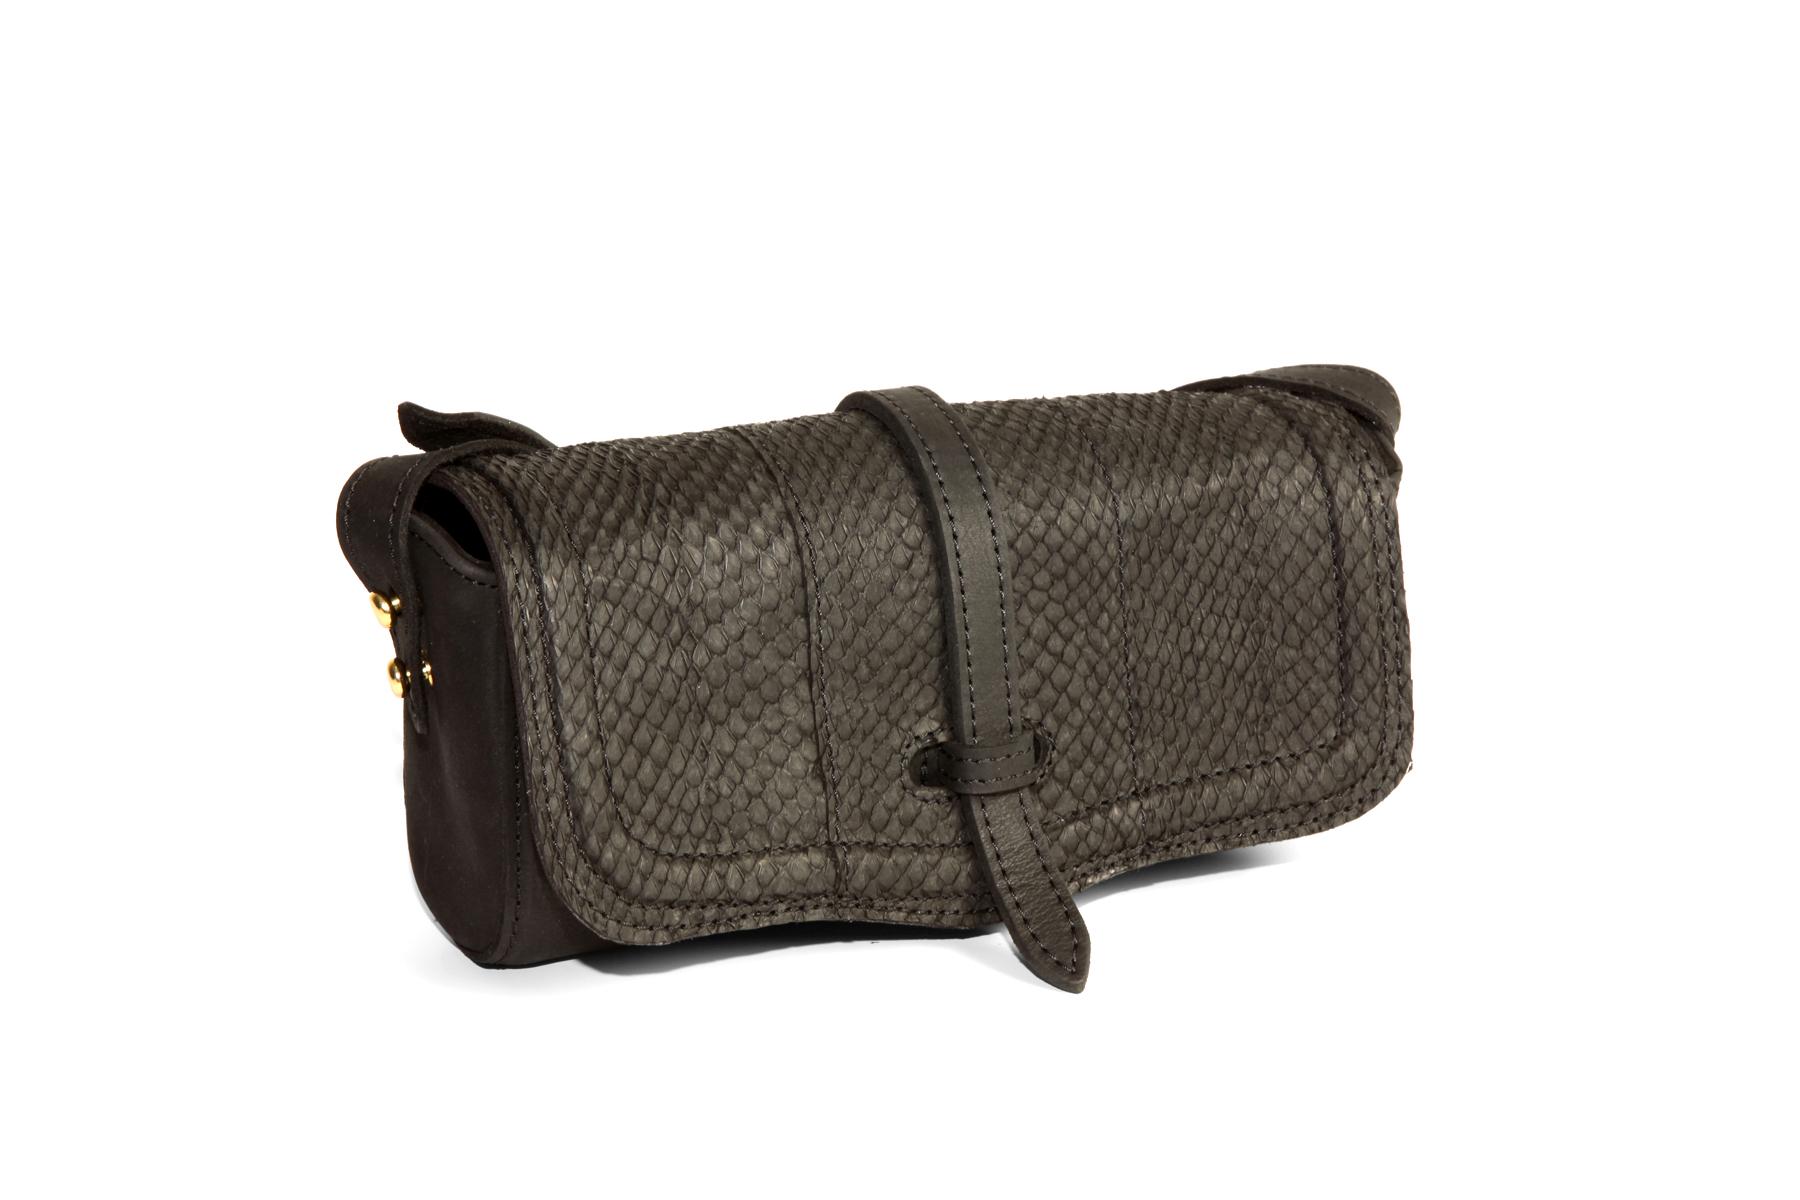 Mahiout Tatra clutch in salmon skin and nubuck leather